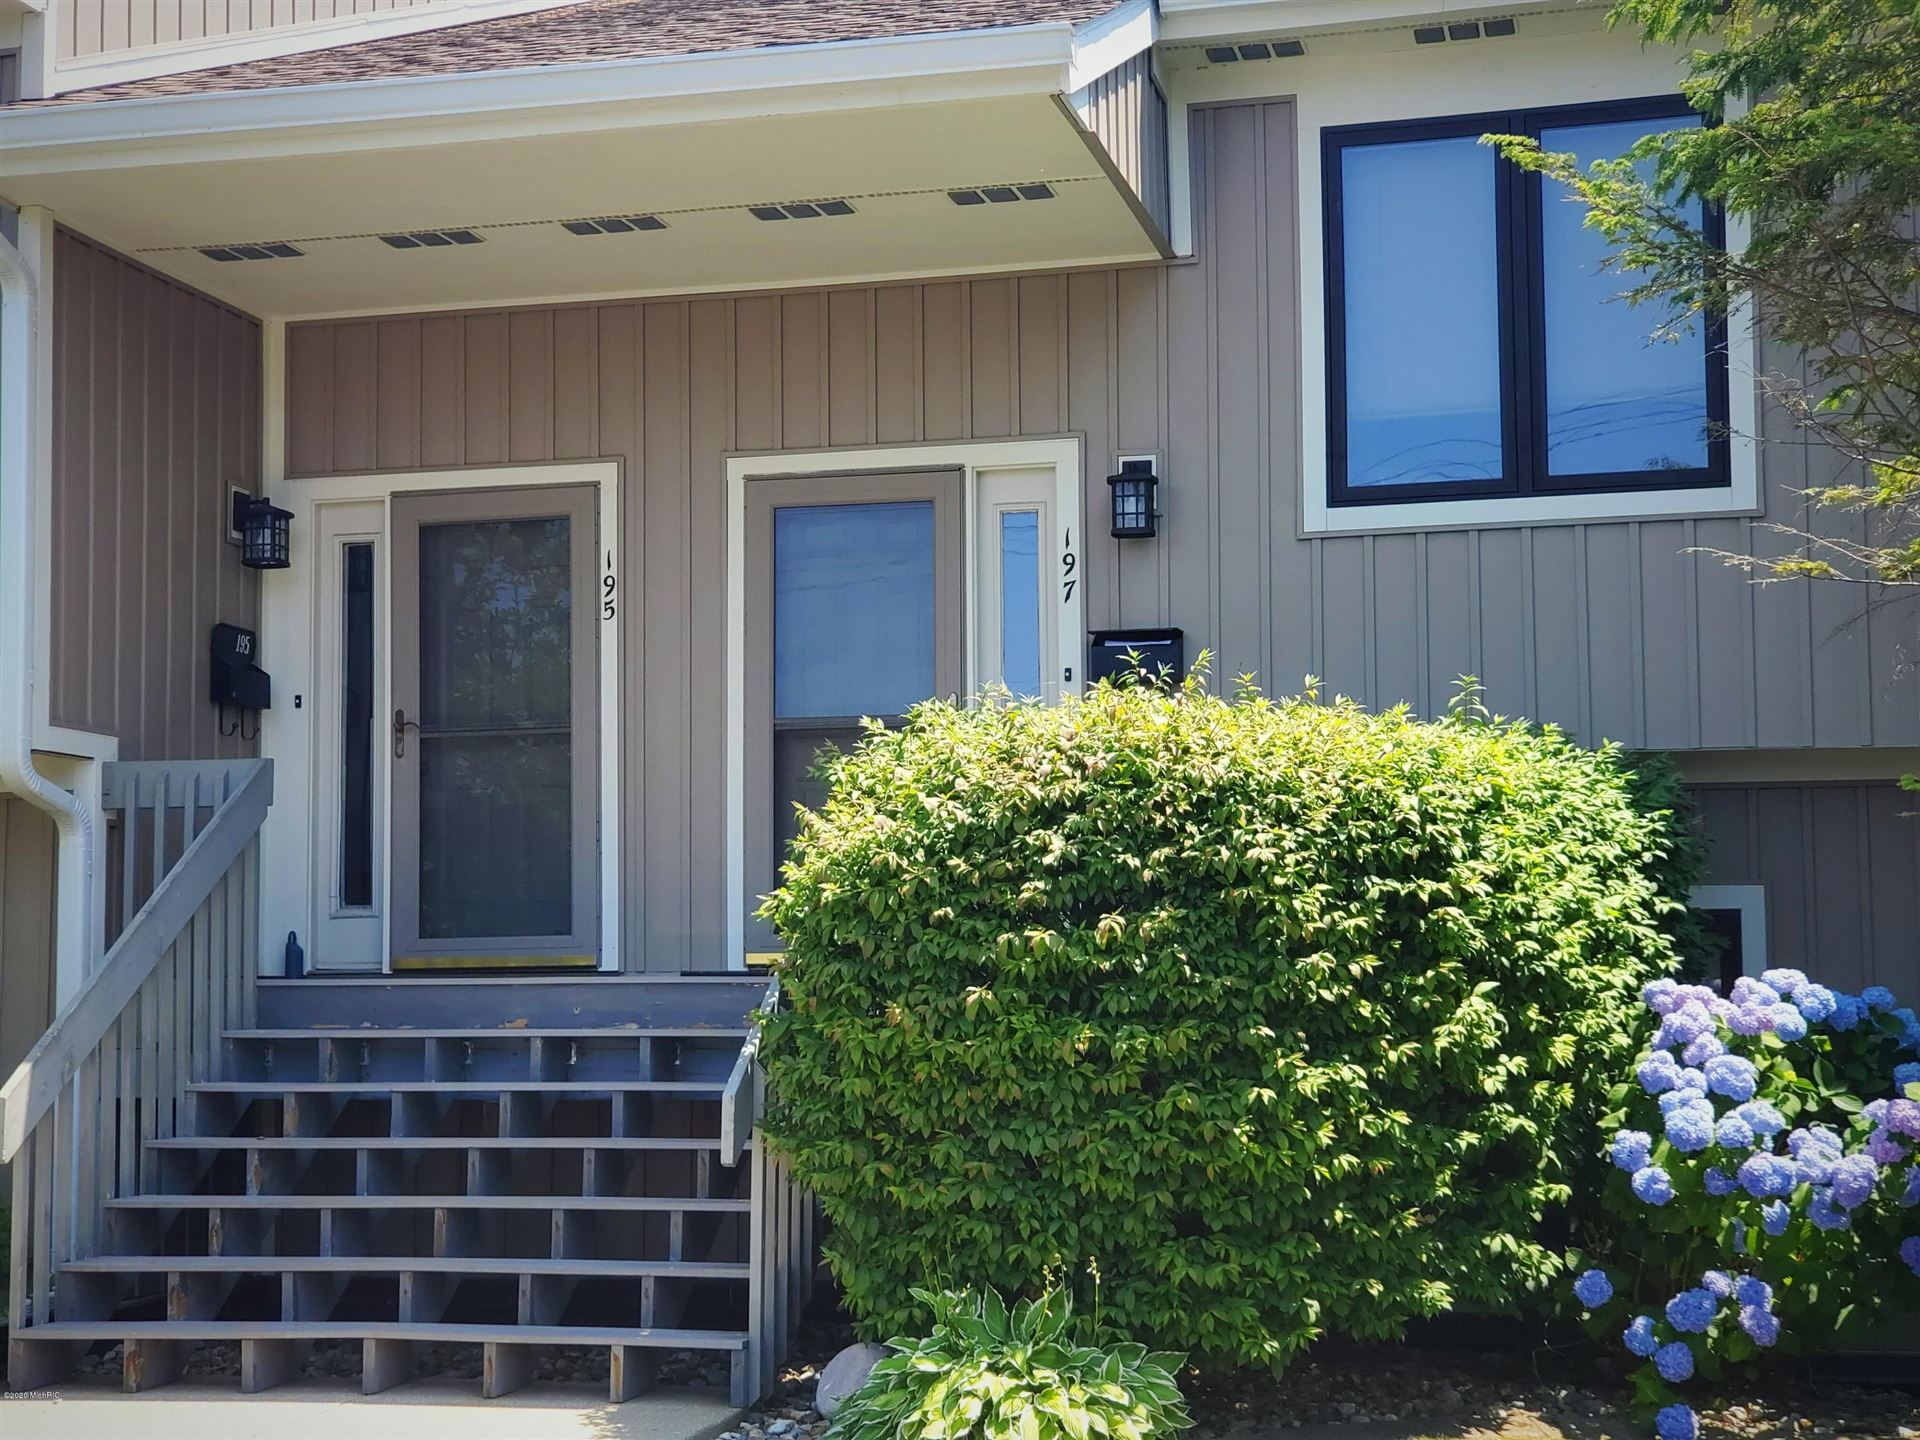 195 Wayne Street, Saint Joseph, MI 49085 - MLS#: 20025630